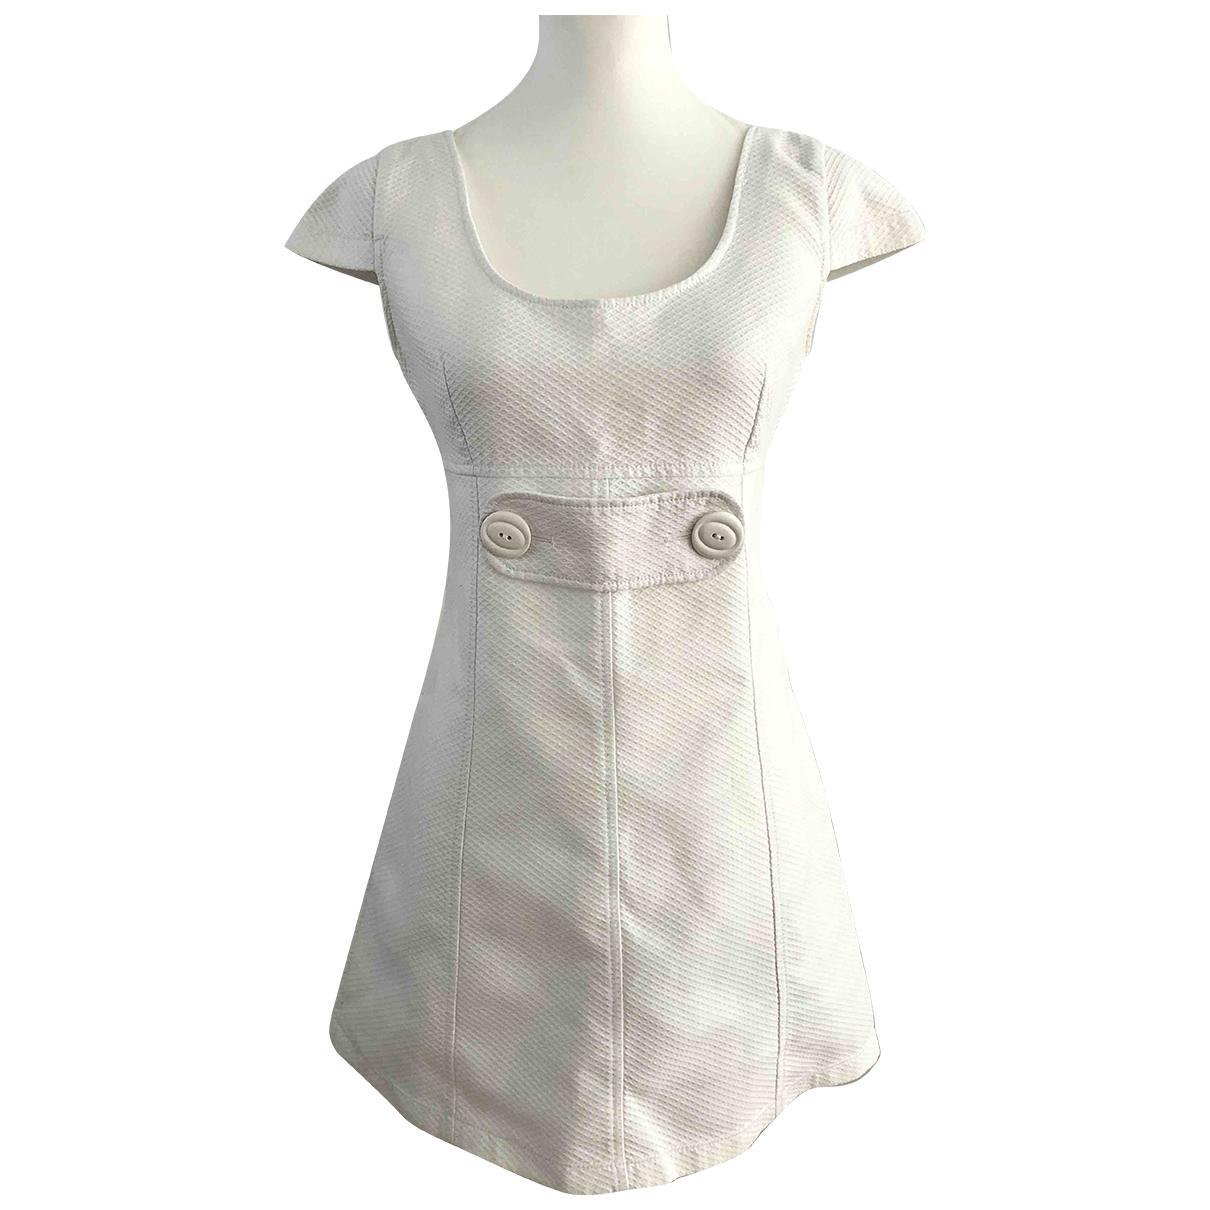 D&g \N White Cotton dress for Women 42 IT